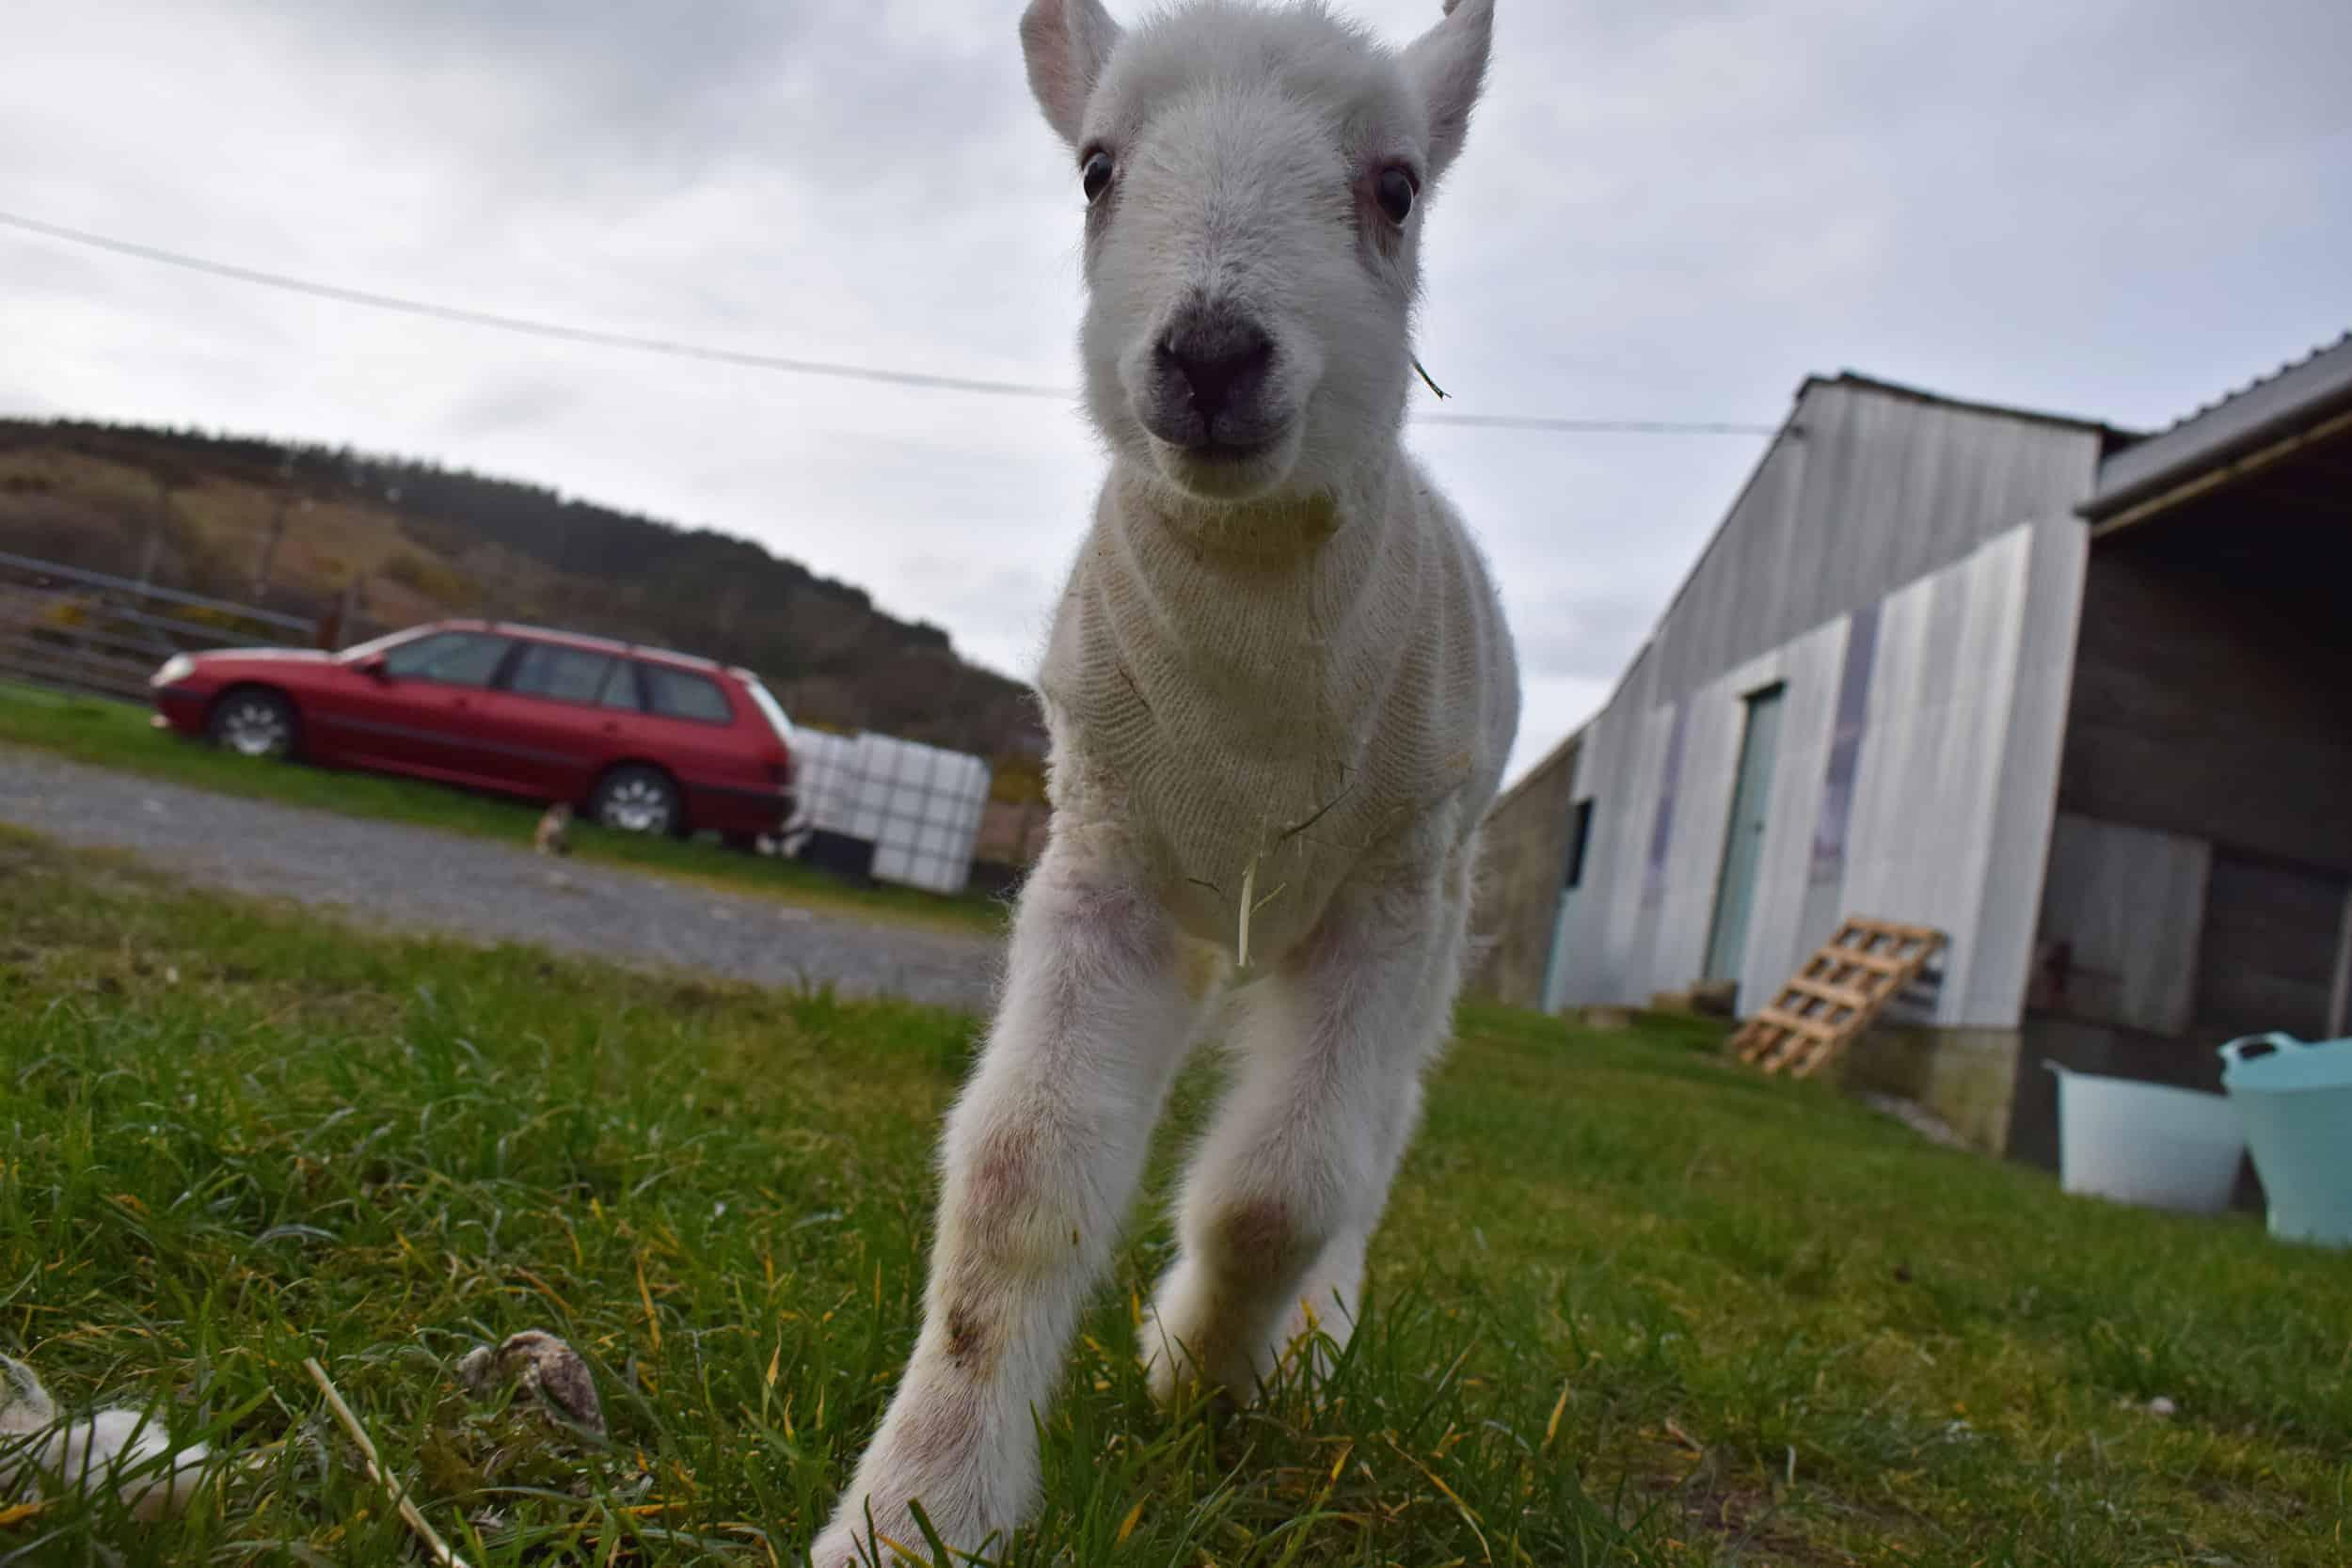 Lily bfl blueface leicester sheep ewe lamb pet bottle baby lamb jumper